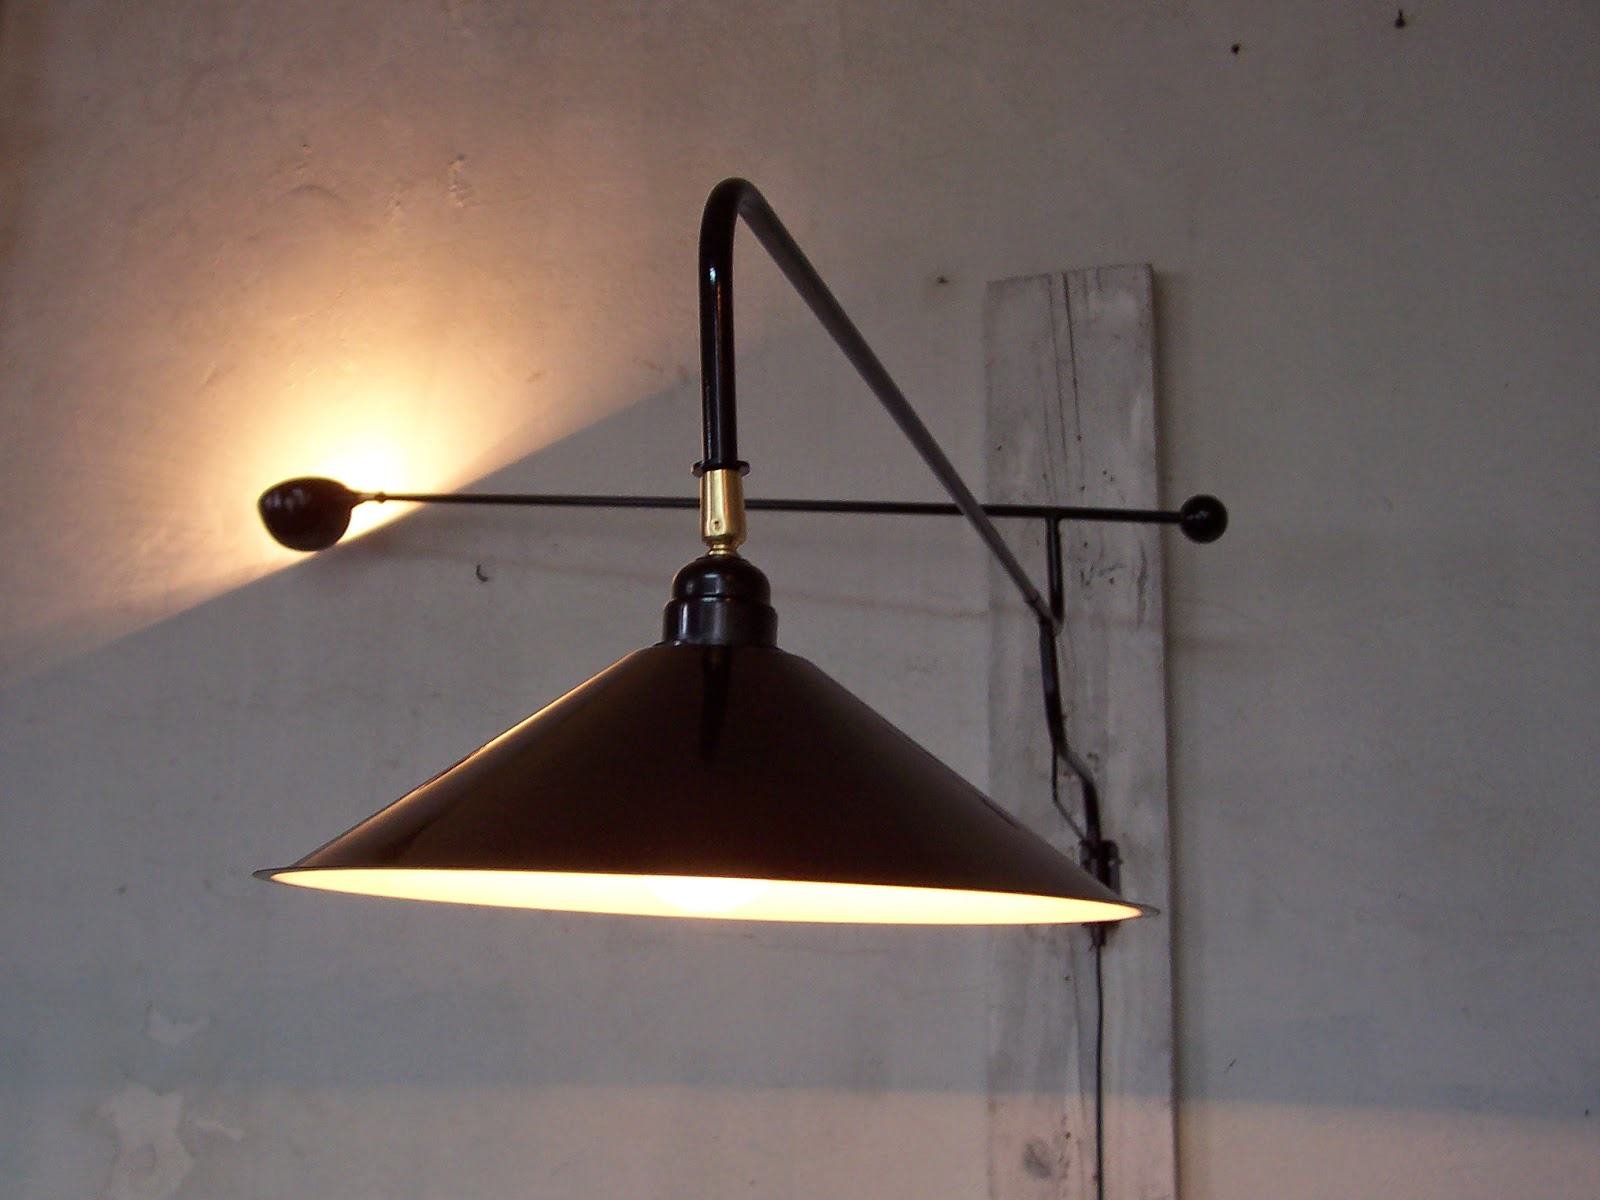 wall lights 2017 lampe potence applique murale design 1950 vintage wall lamp 15. Black Bedroom Furniture Sets. Home Design Ideas